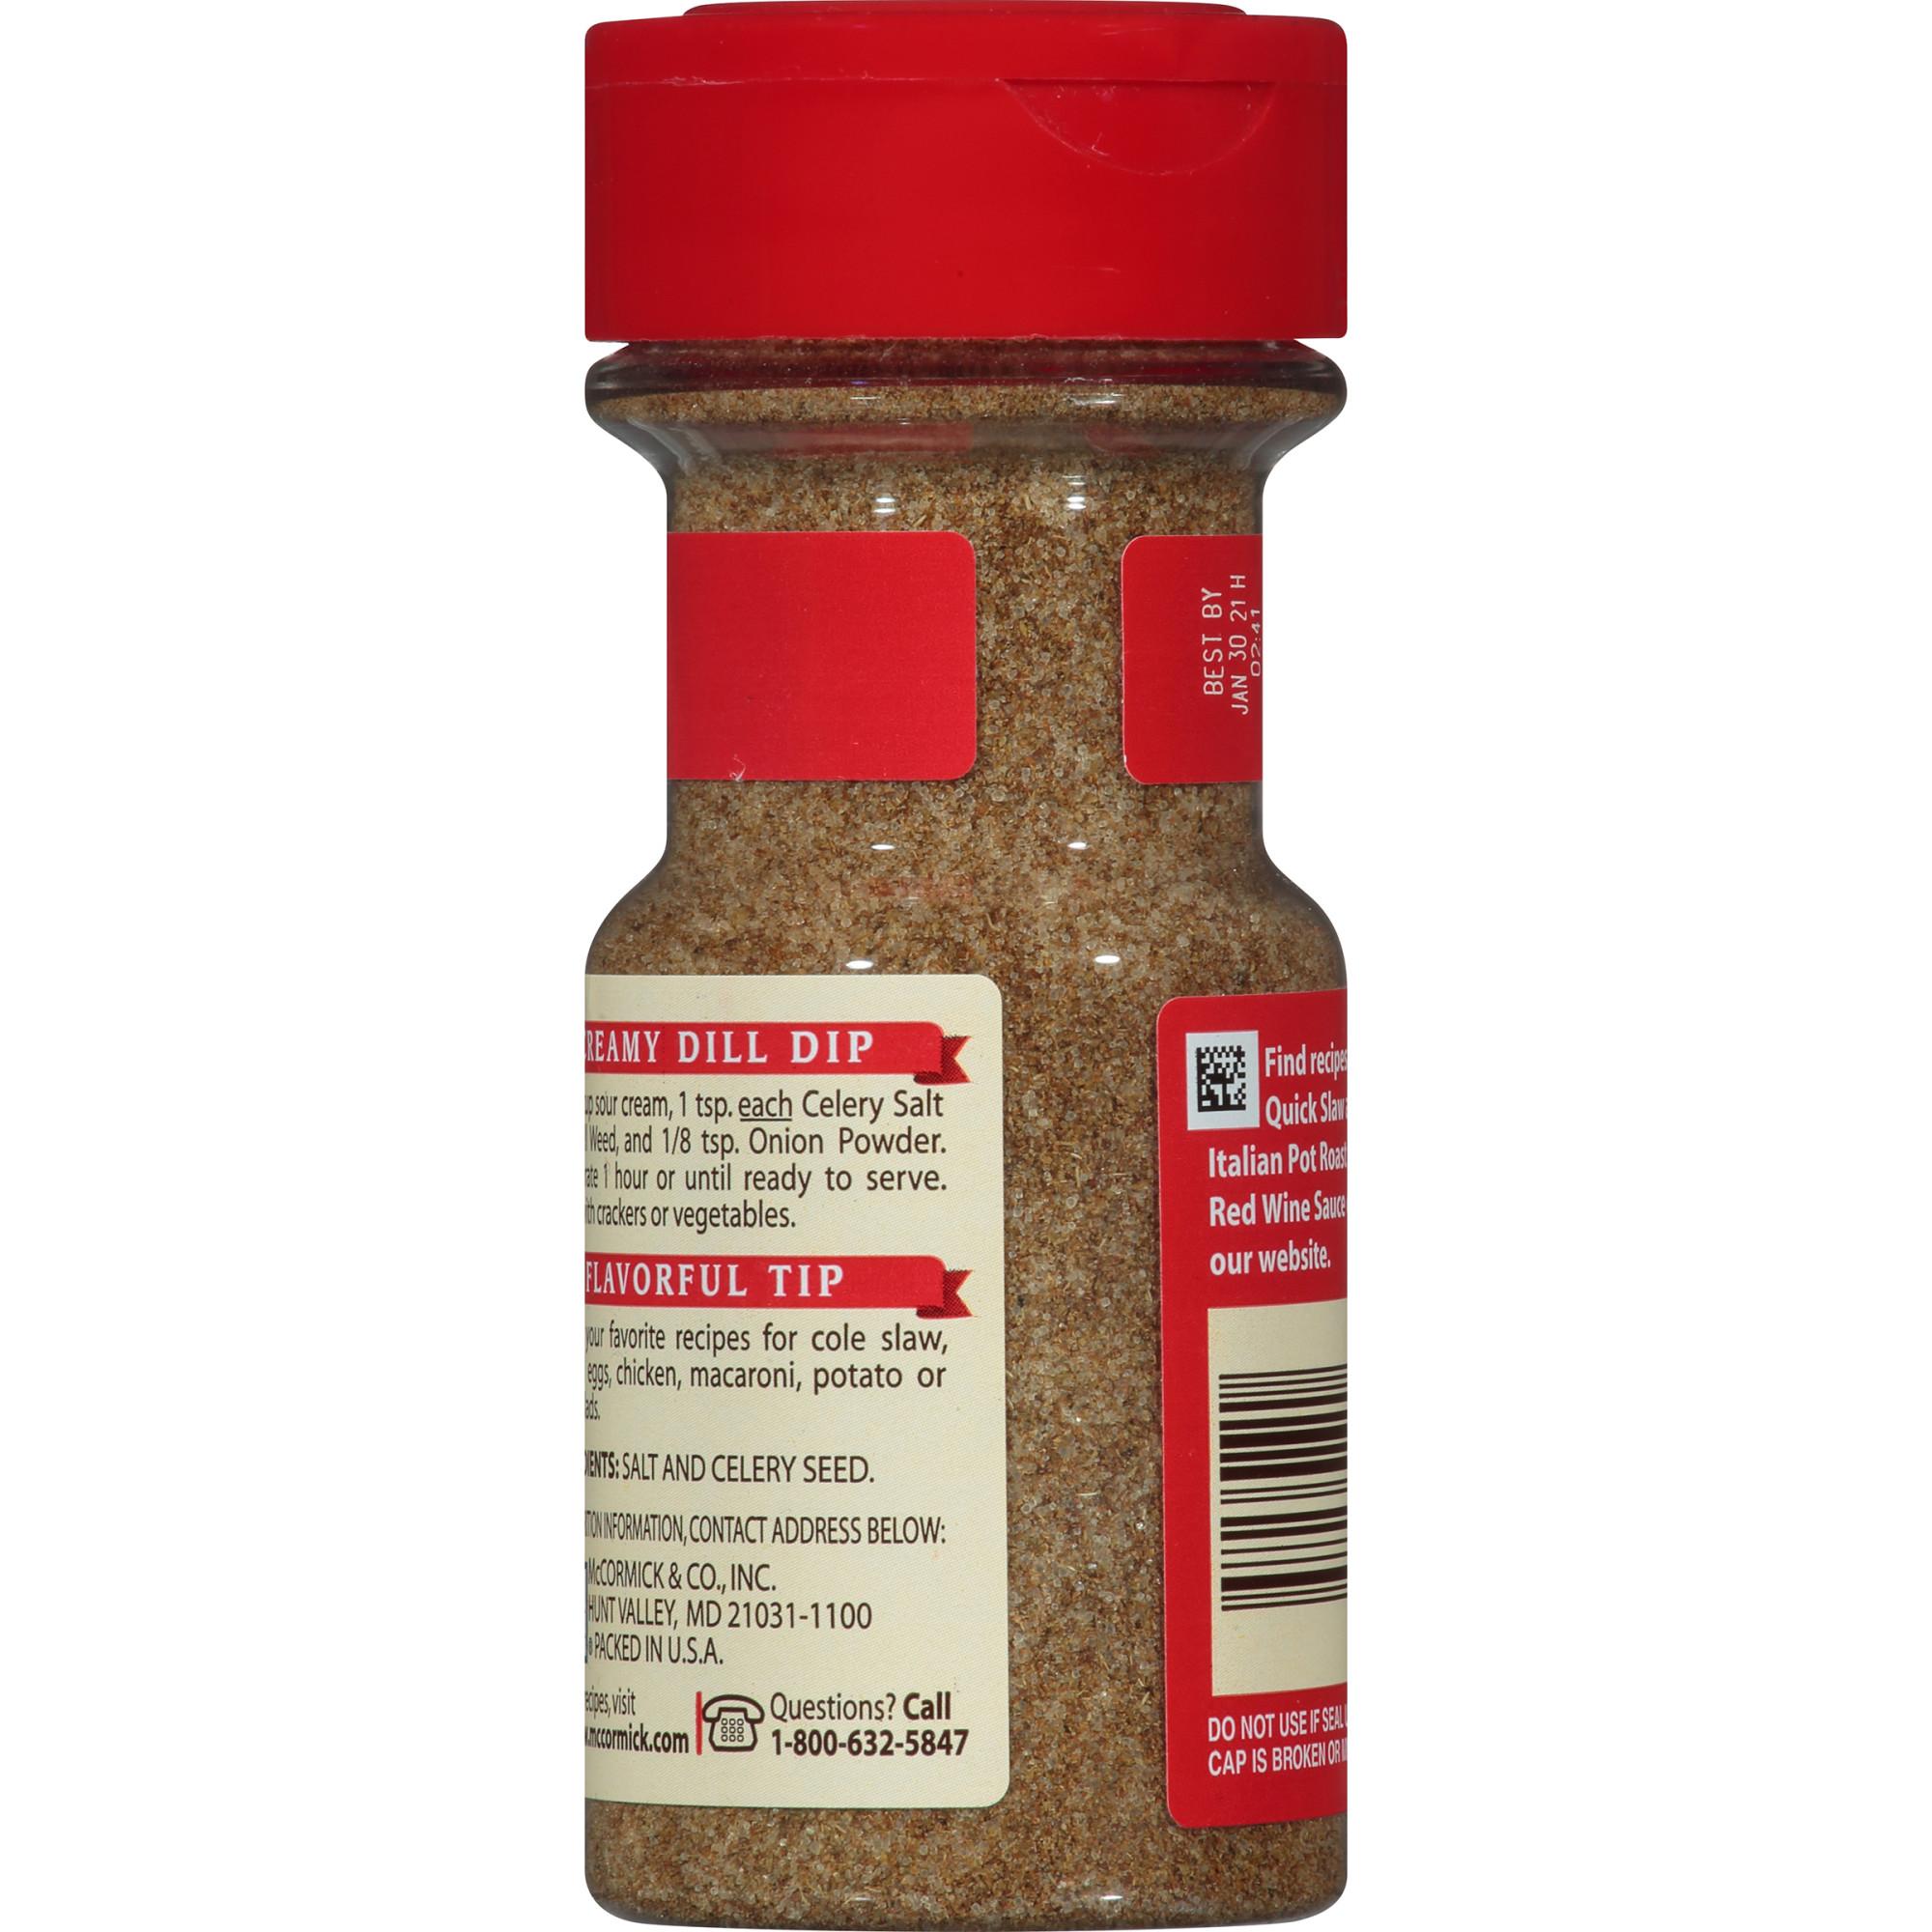 Mccormick Celery Salt 4 Oz Best Salt Spices Amp Seasoning